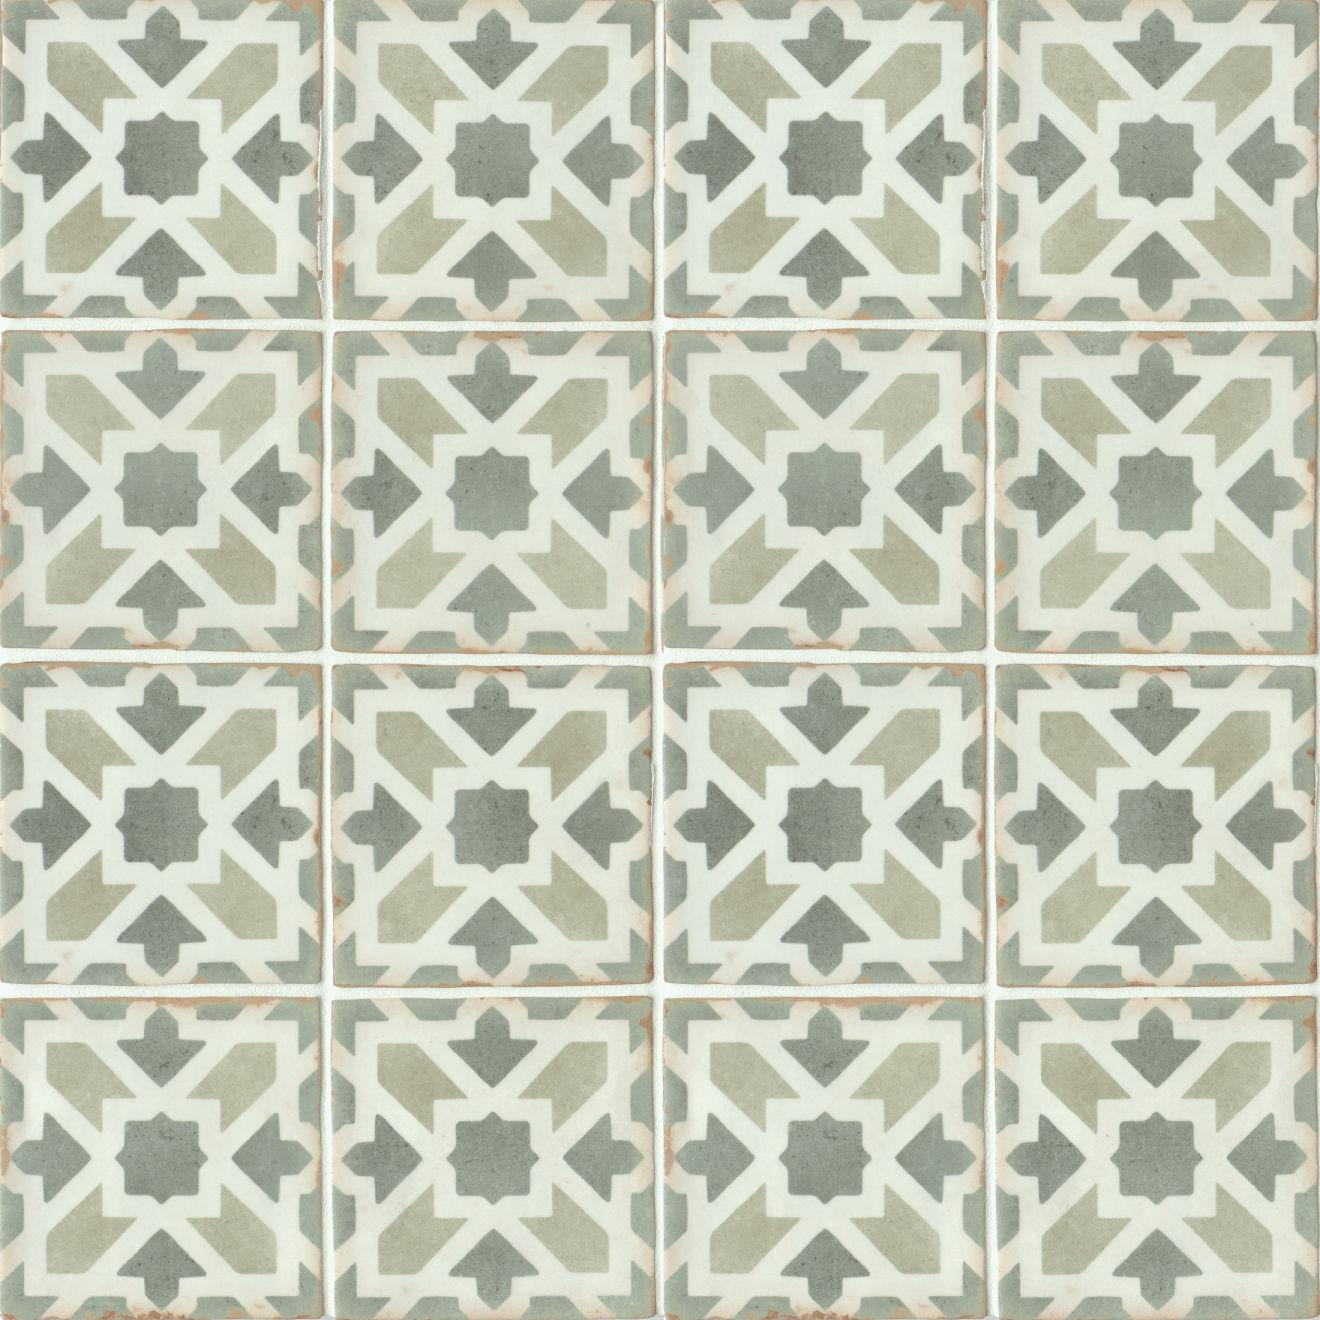 "Casablanca 5"" x 5"" Matte Ceramic Floor and Wall Tile in Malik"